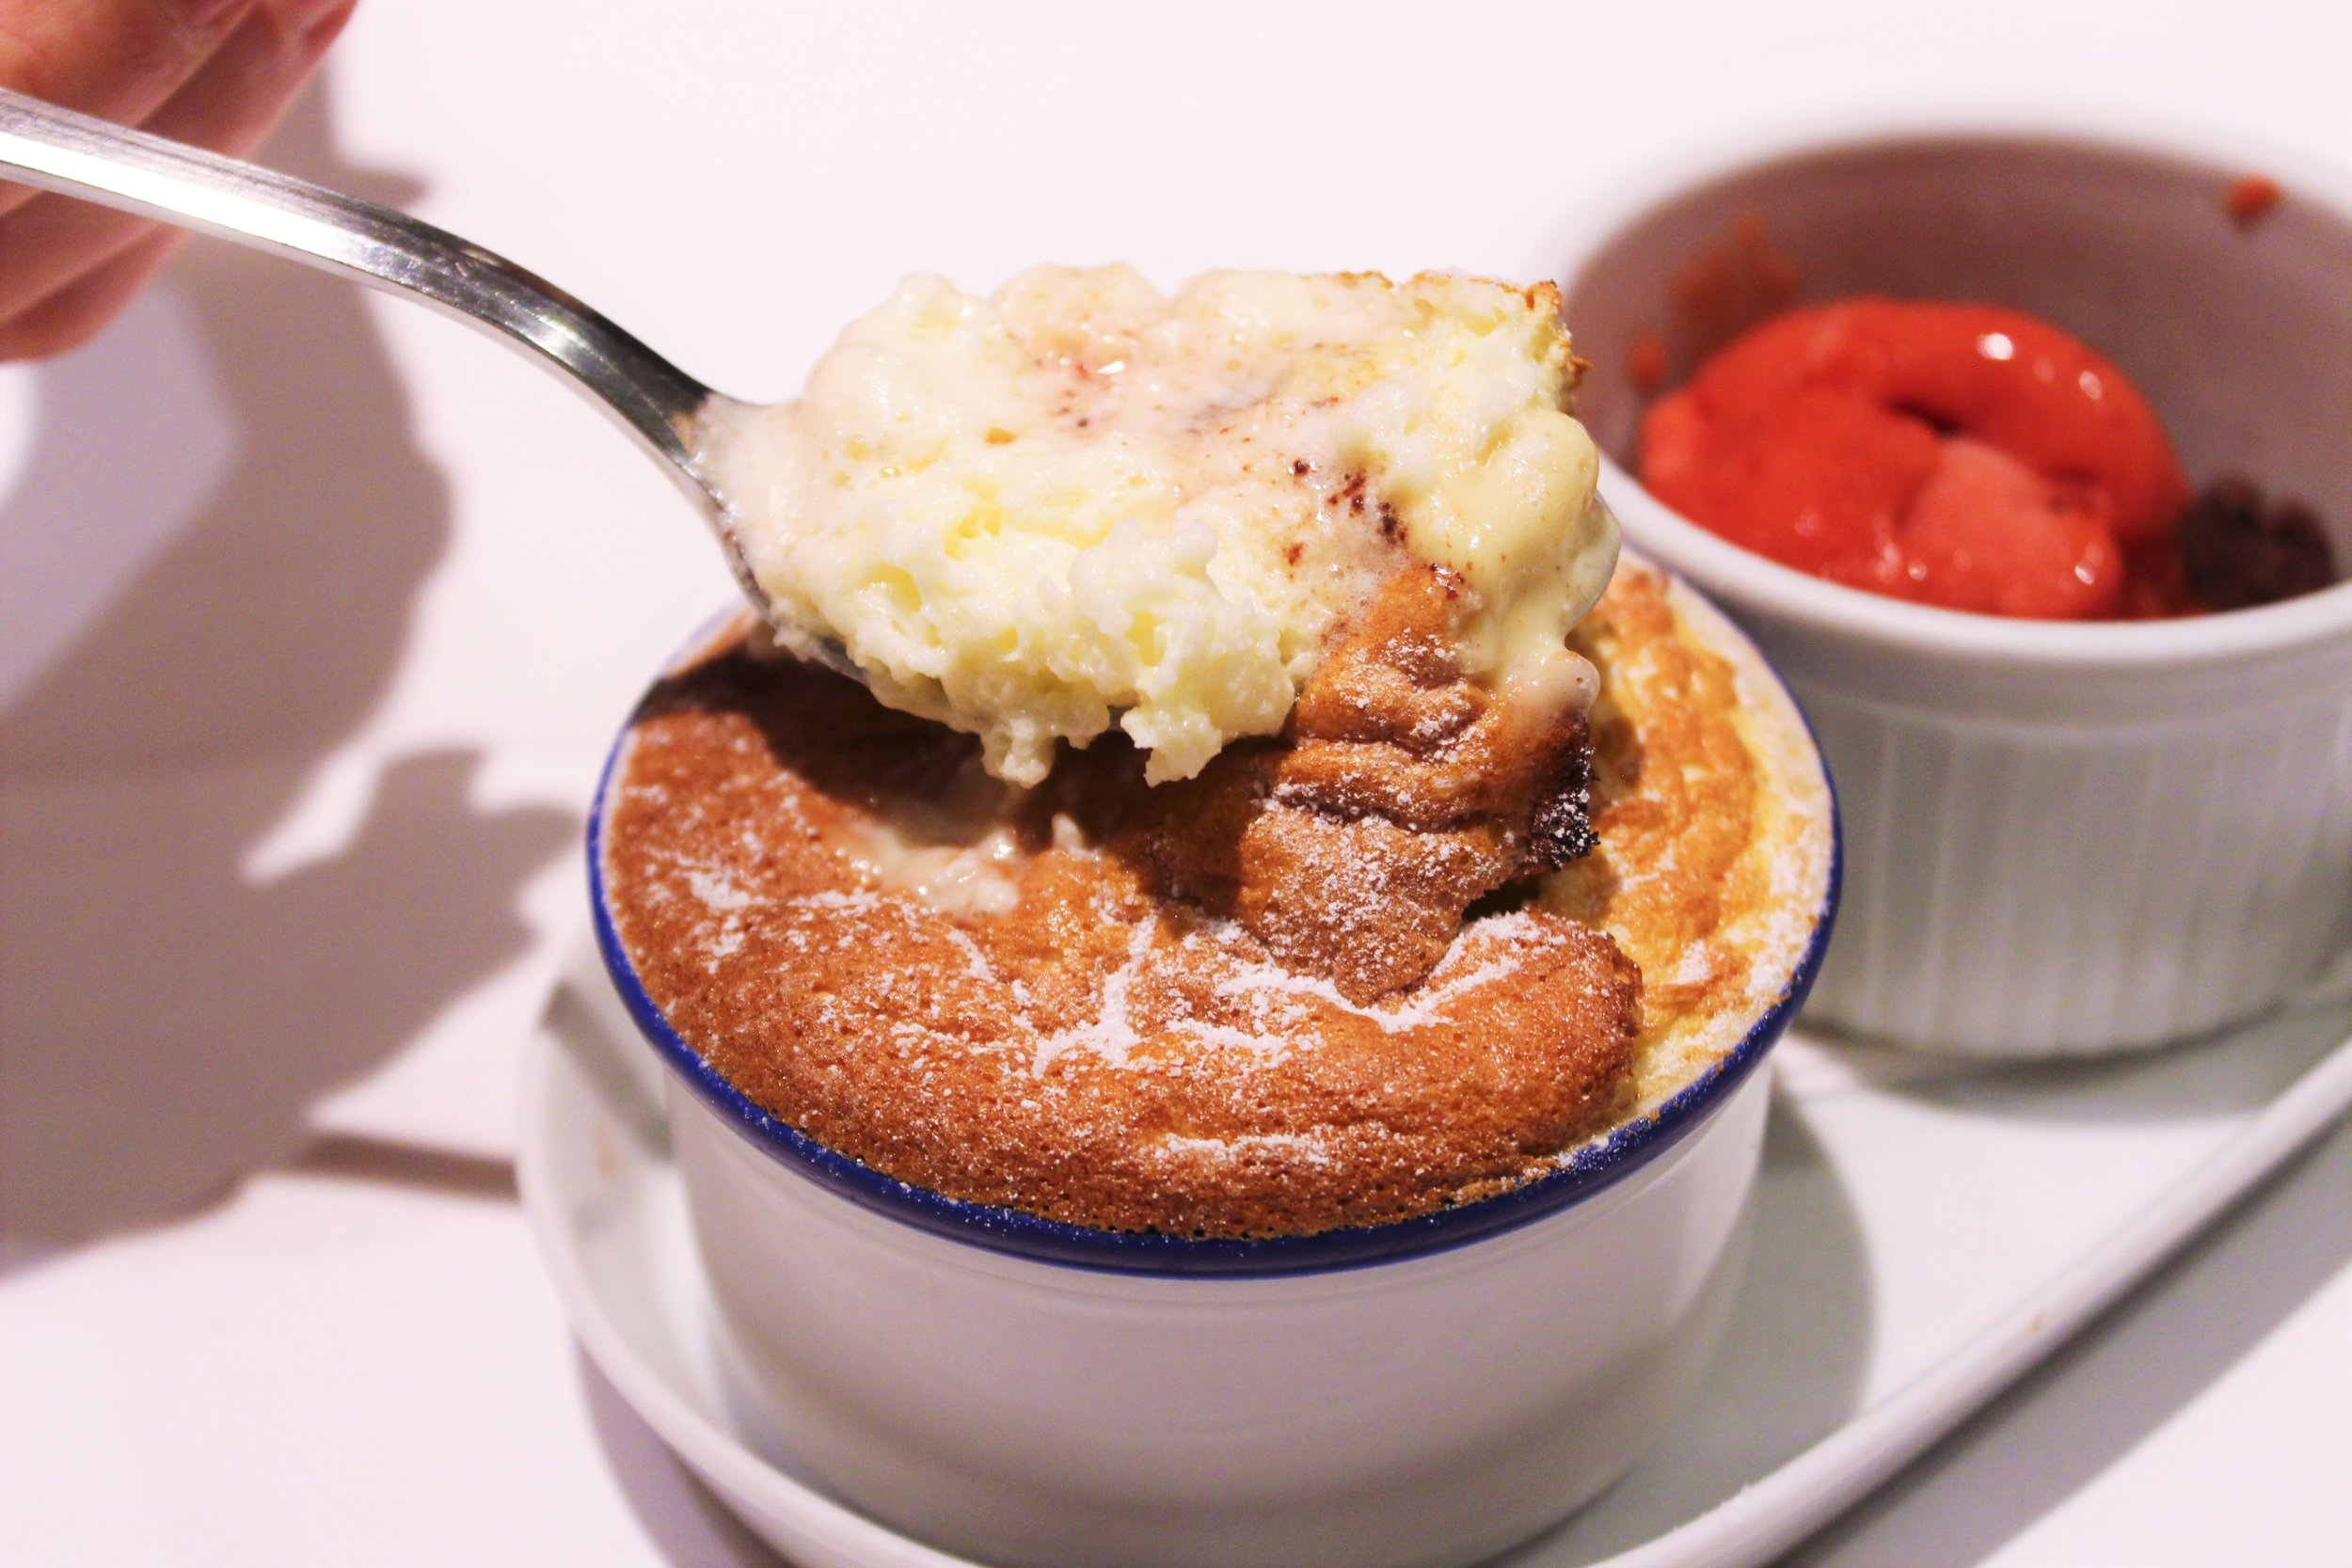 Cream Cheese Souffle with Raspberry Ice Cream at Igueldo in Barcelona